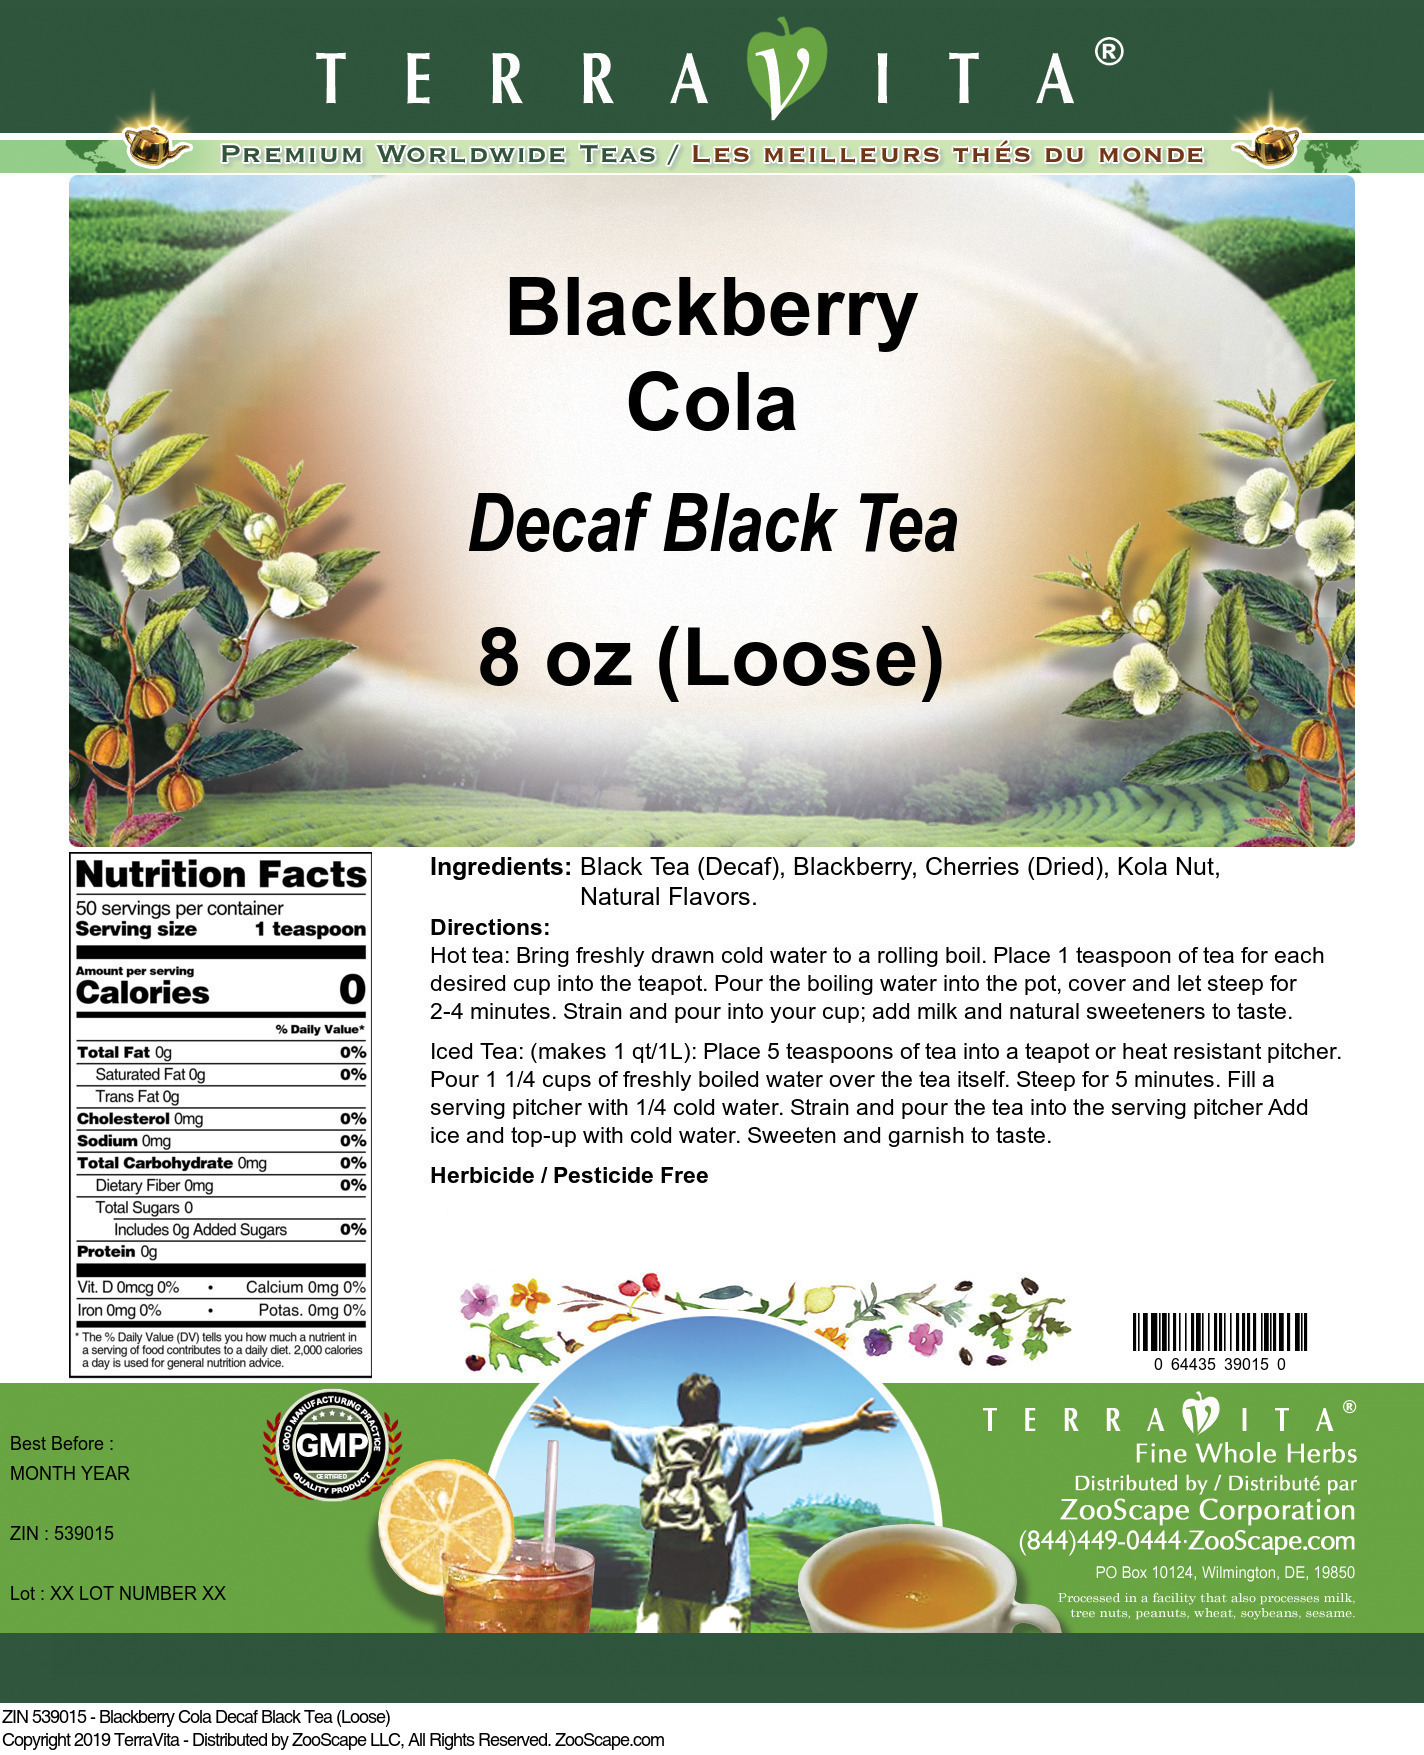 Blackberry Cola Decaf Black Tea (Loose)